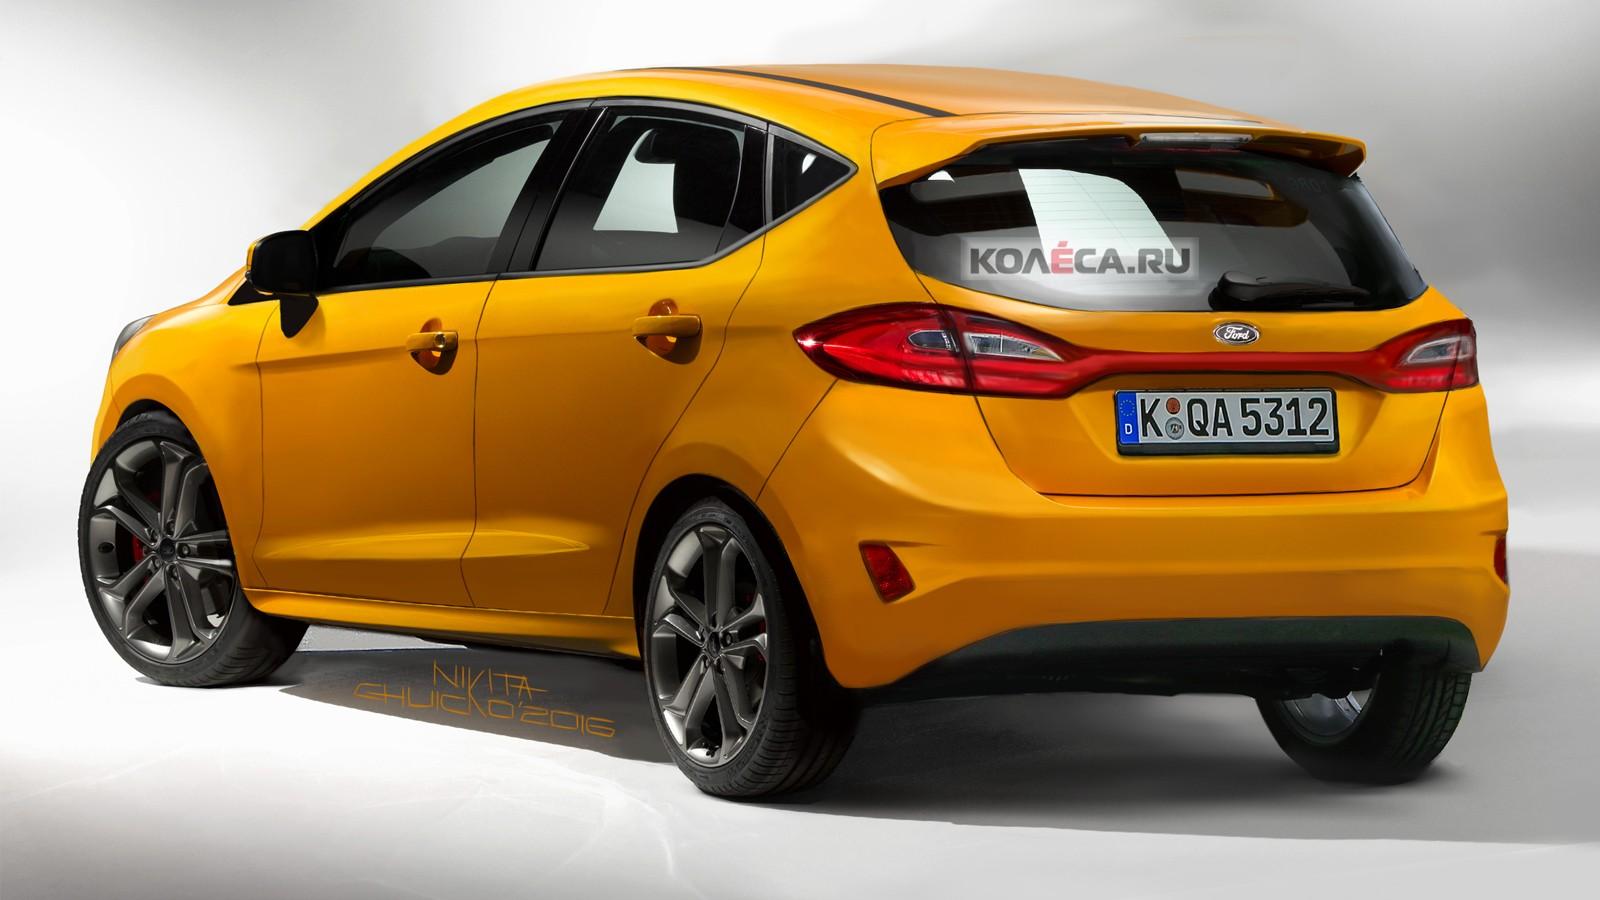 Ford Fiesta rear